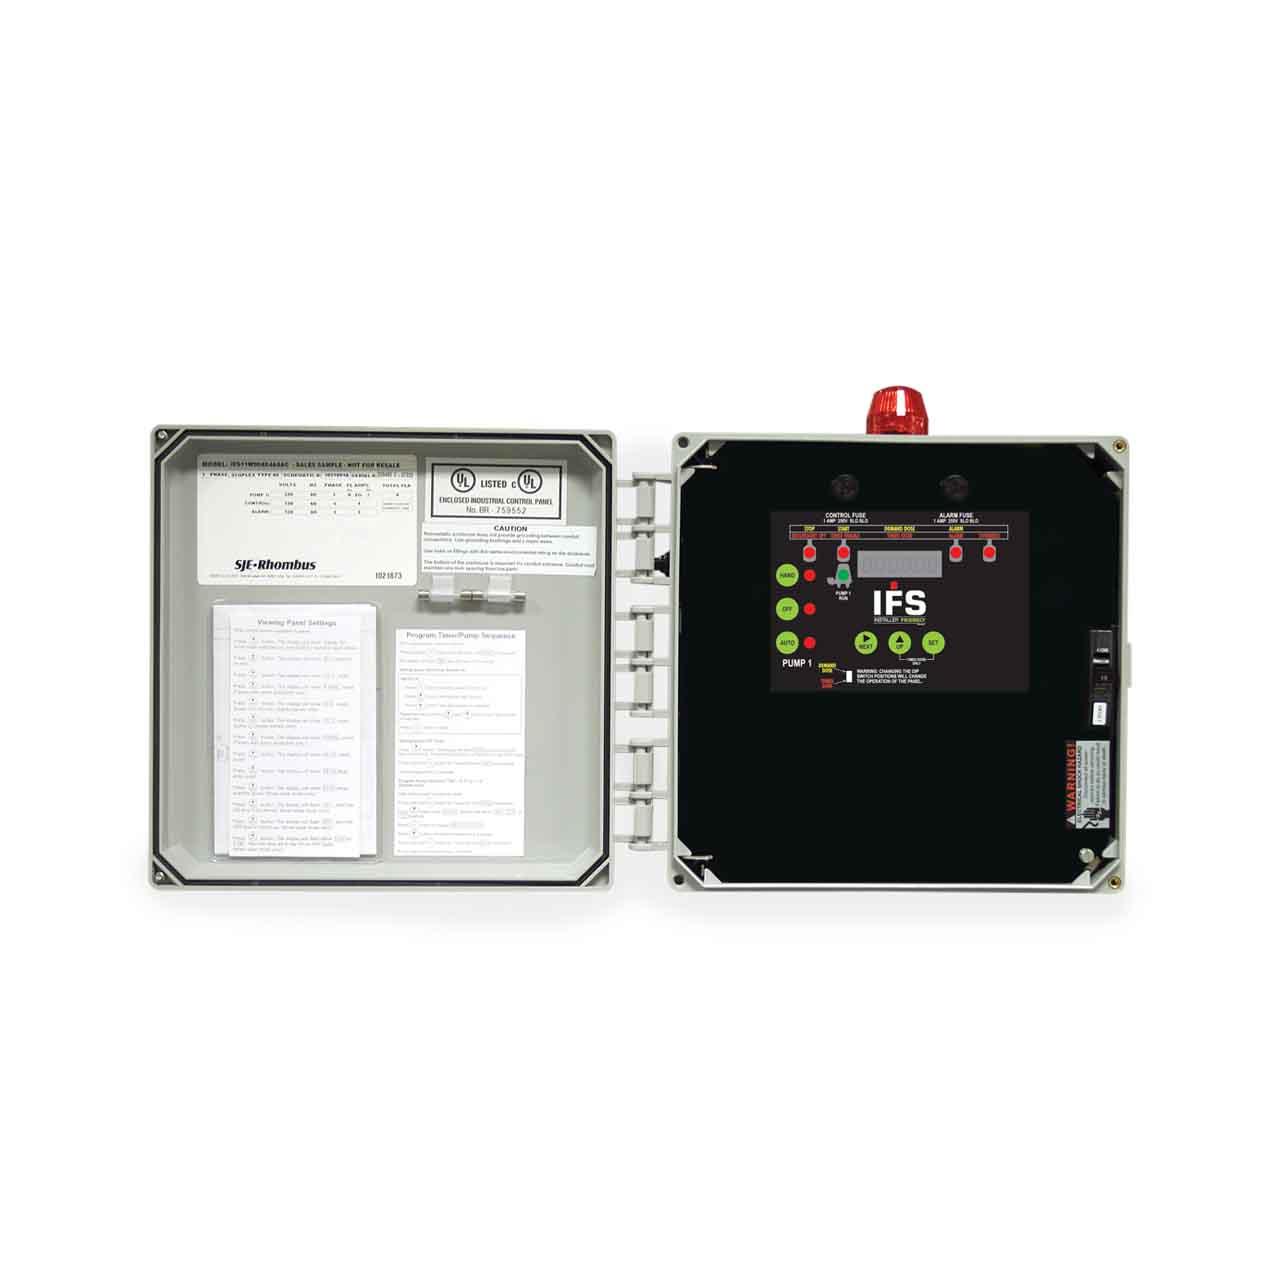 sje rhombus model ifs single phase 120 208 240v simplex control panel ASSA ABLOY Wiring Diagrams